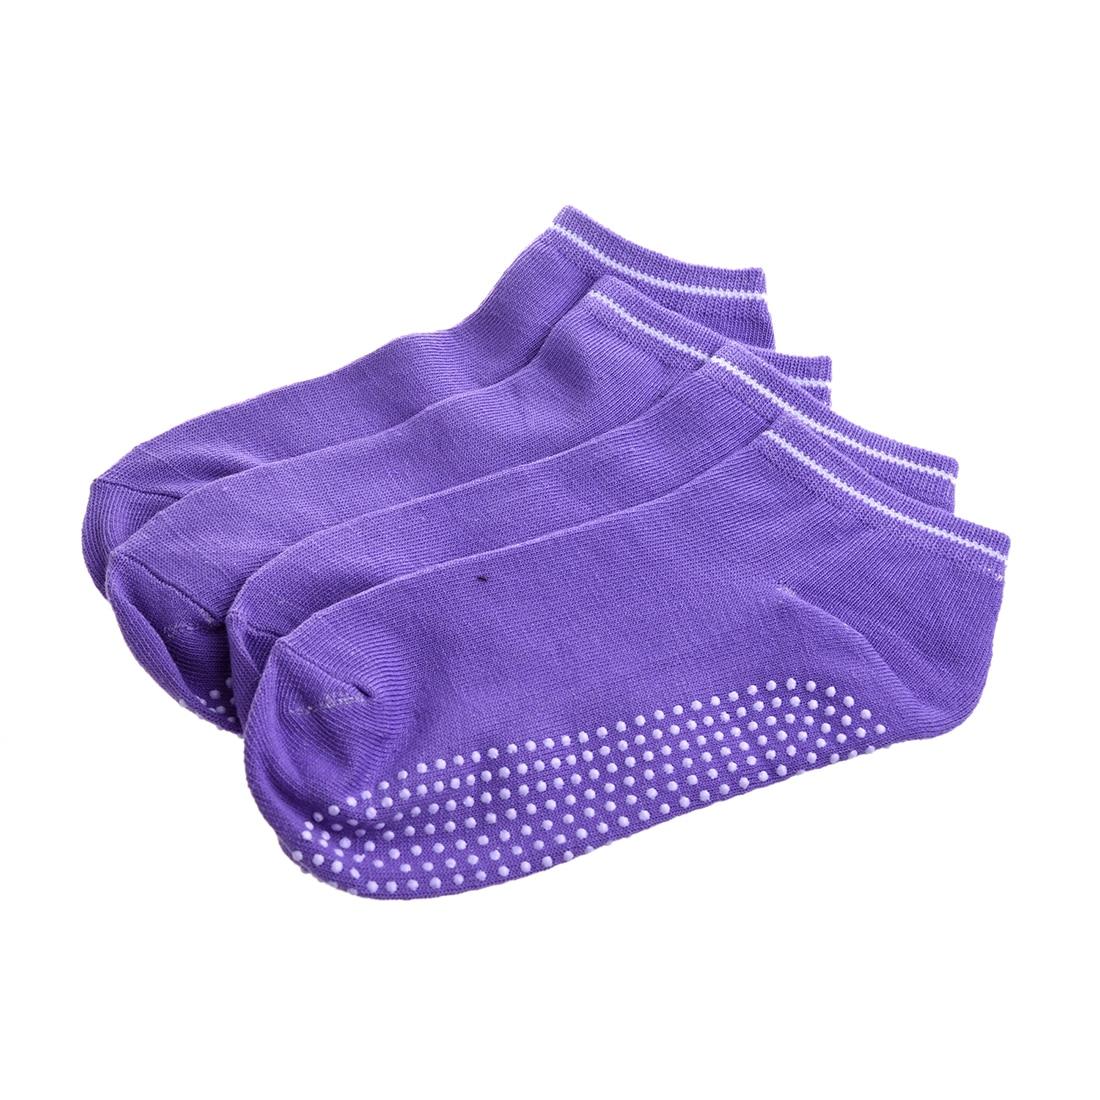 2017 NEW 2 pairs Socks with non-slip massage Granules for women - Purple